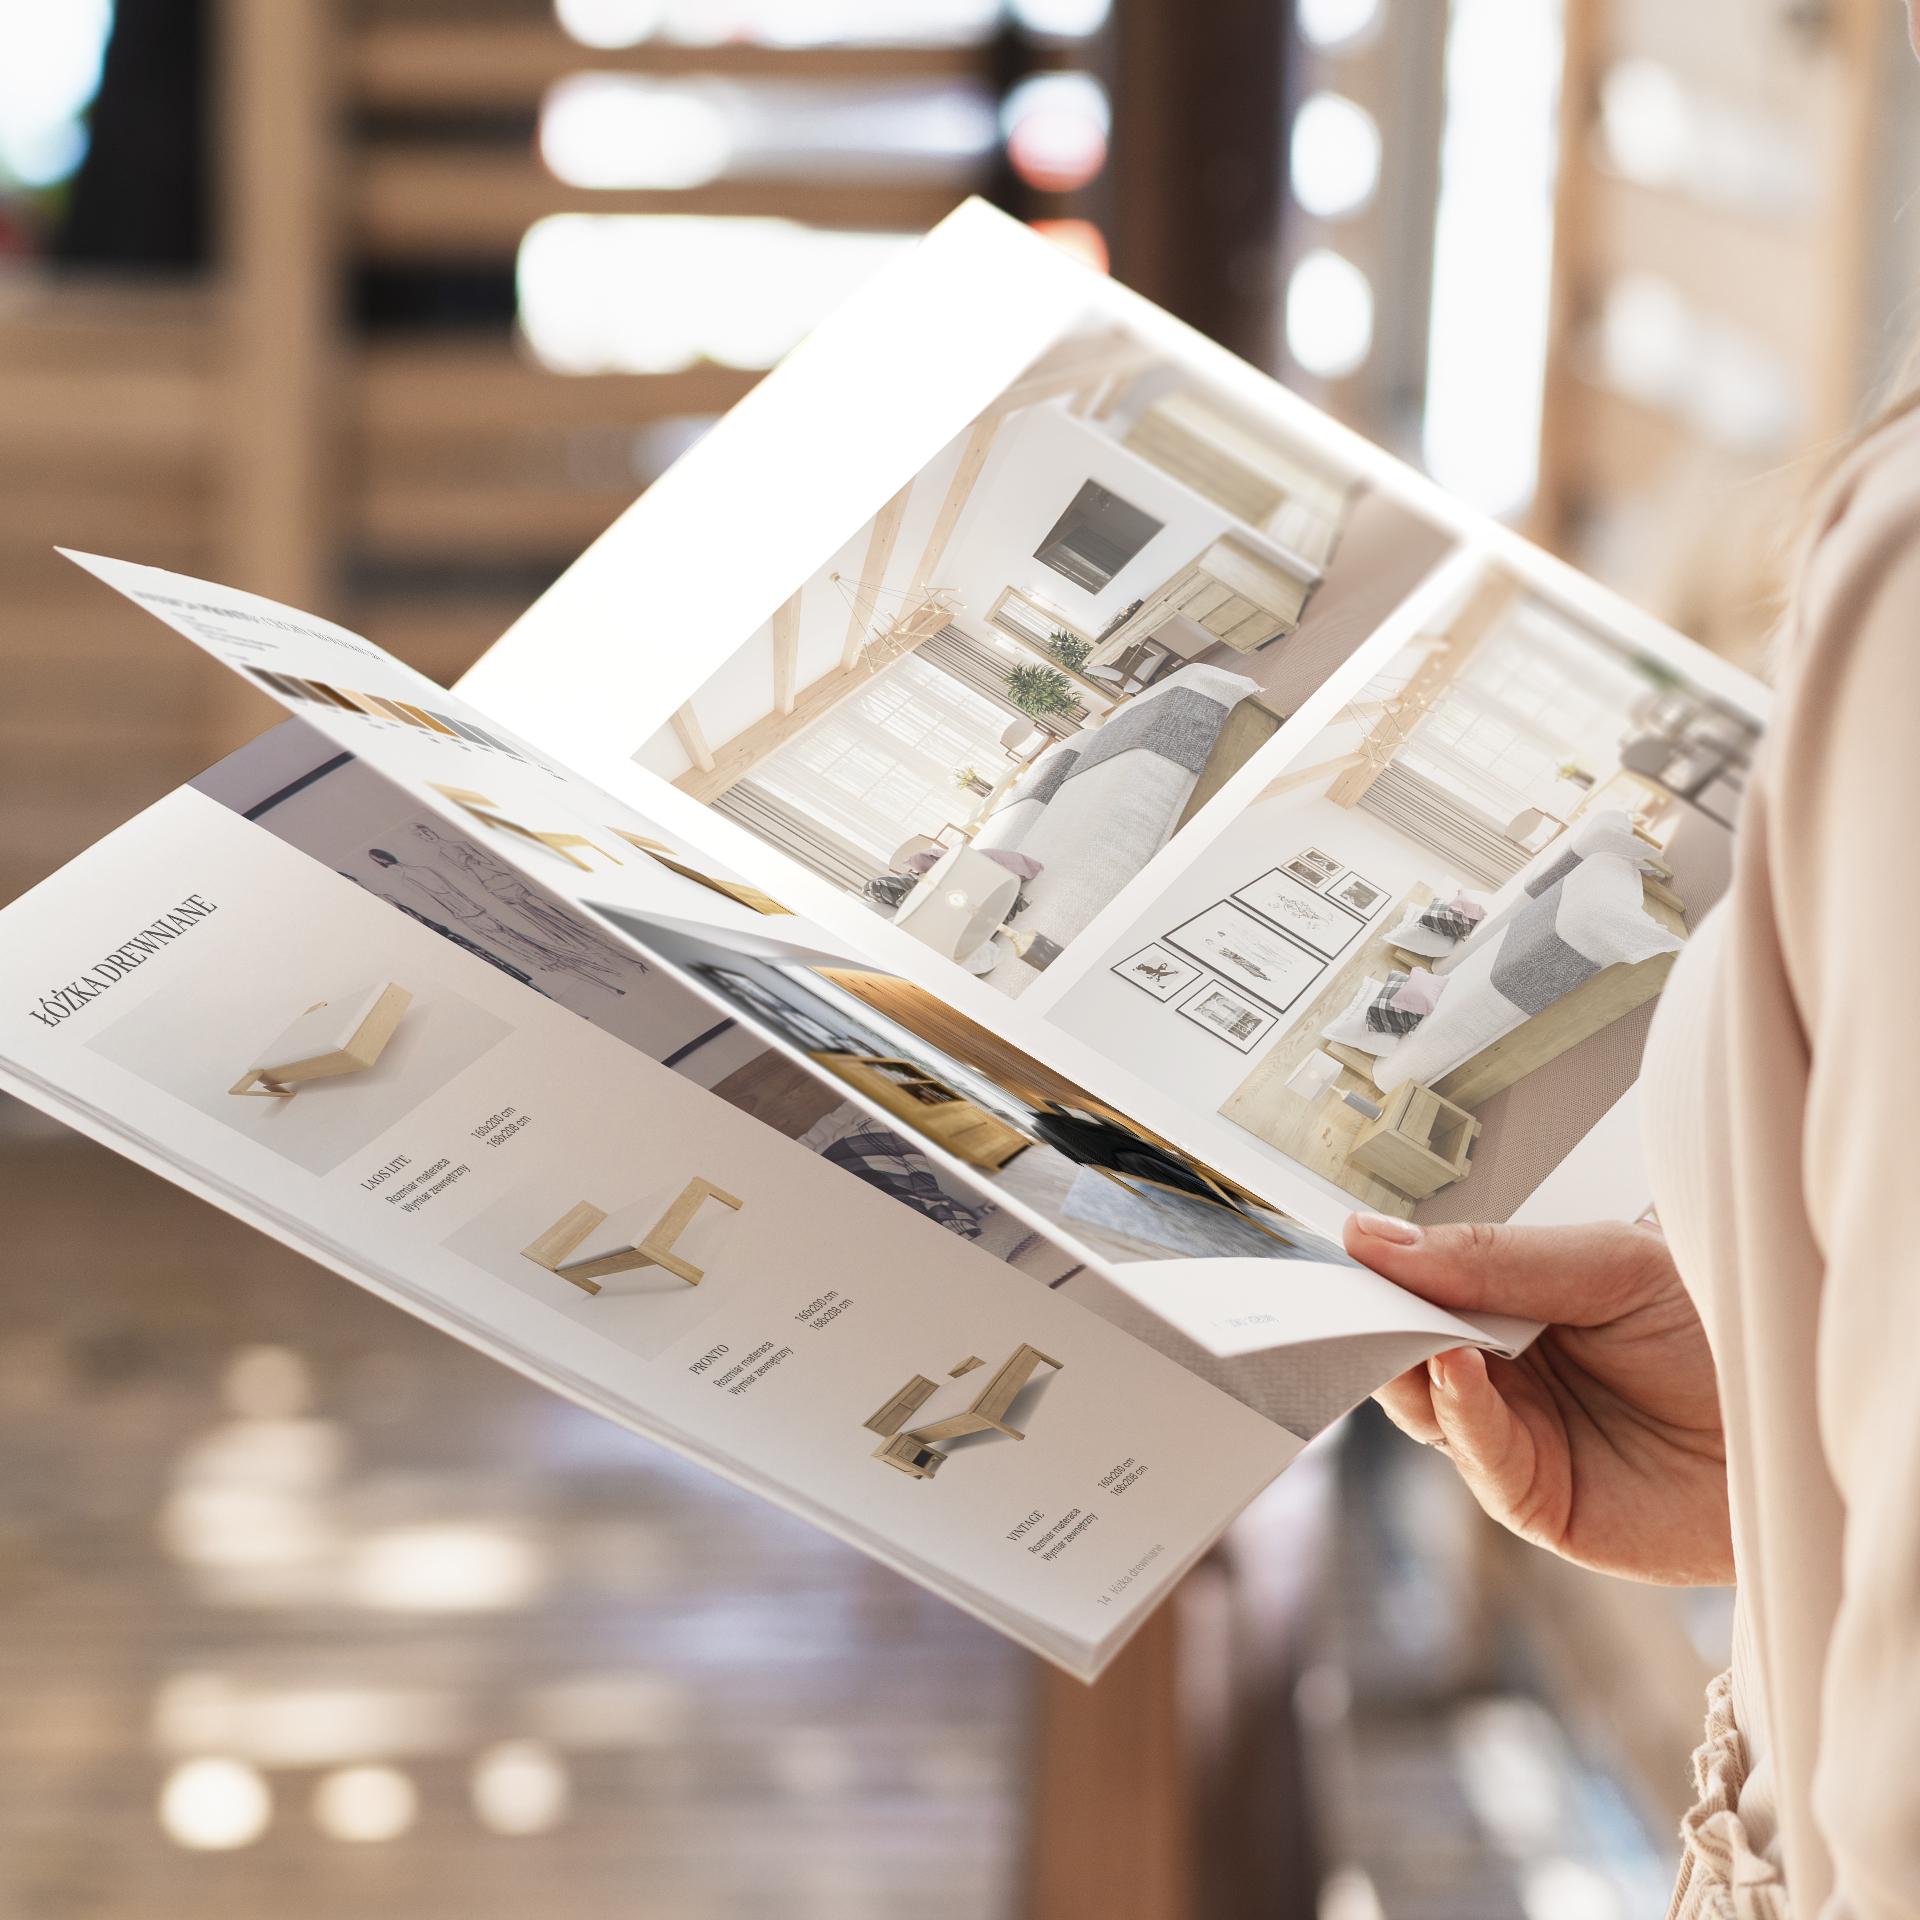 Projekt katalogu z meblami firmy Polano Meble